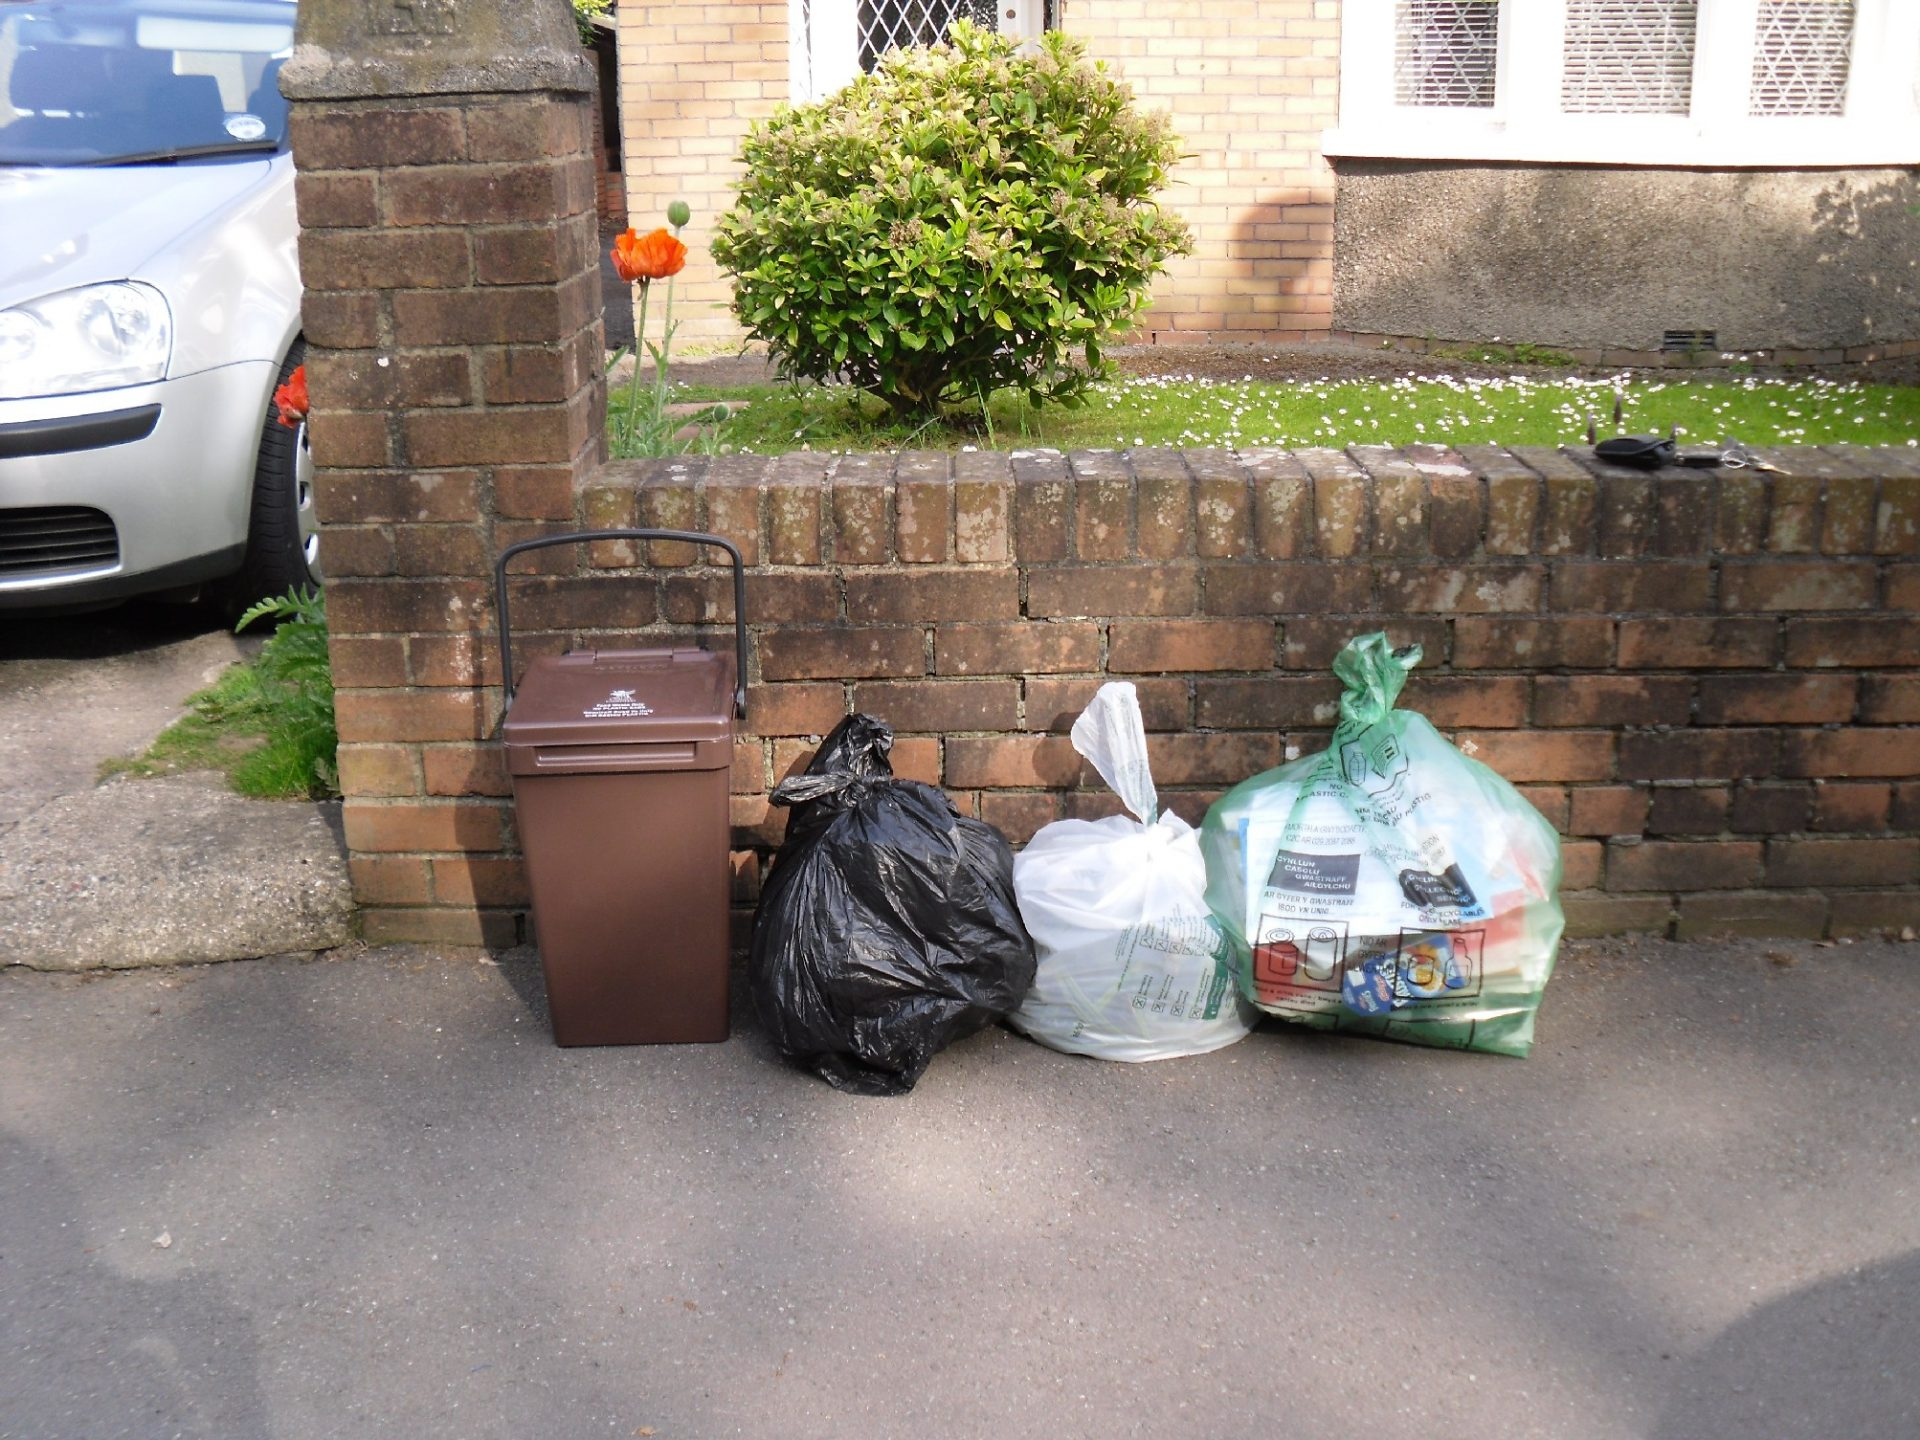 Cardiff Waste Teams